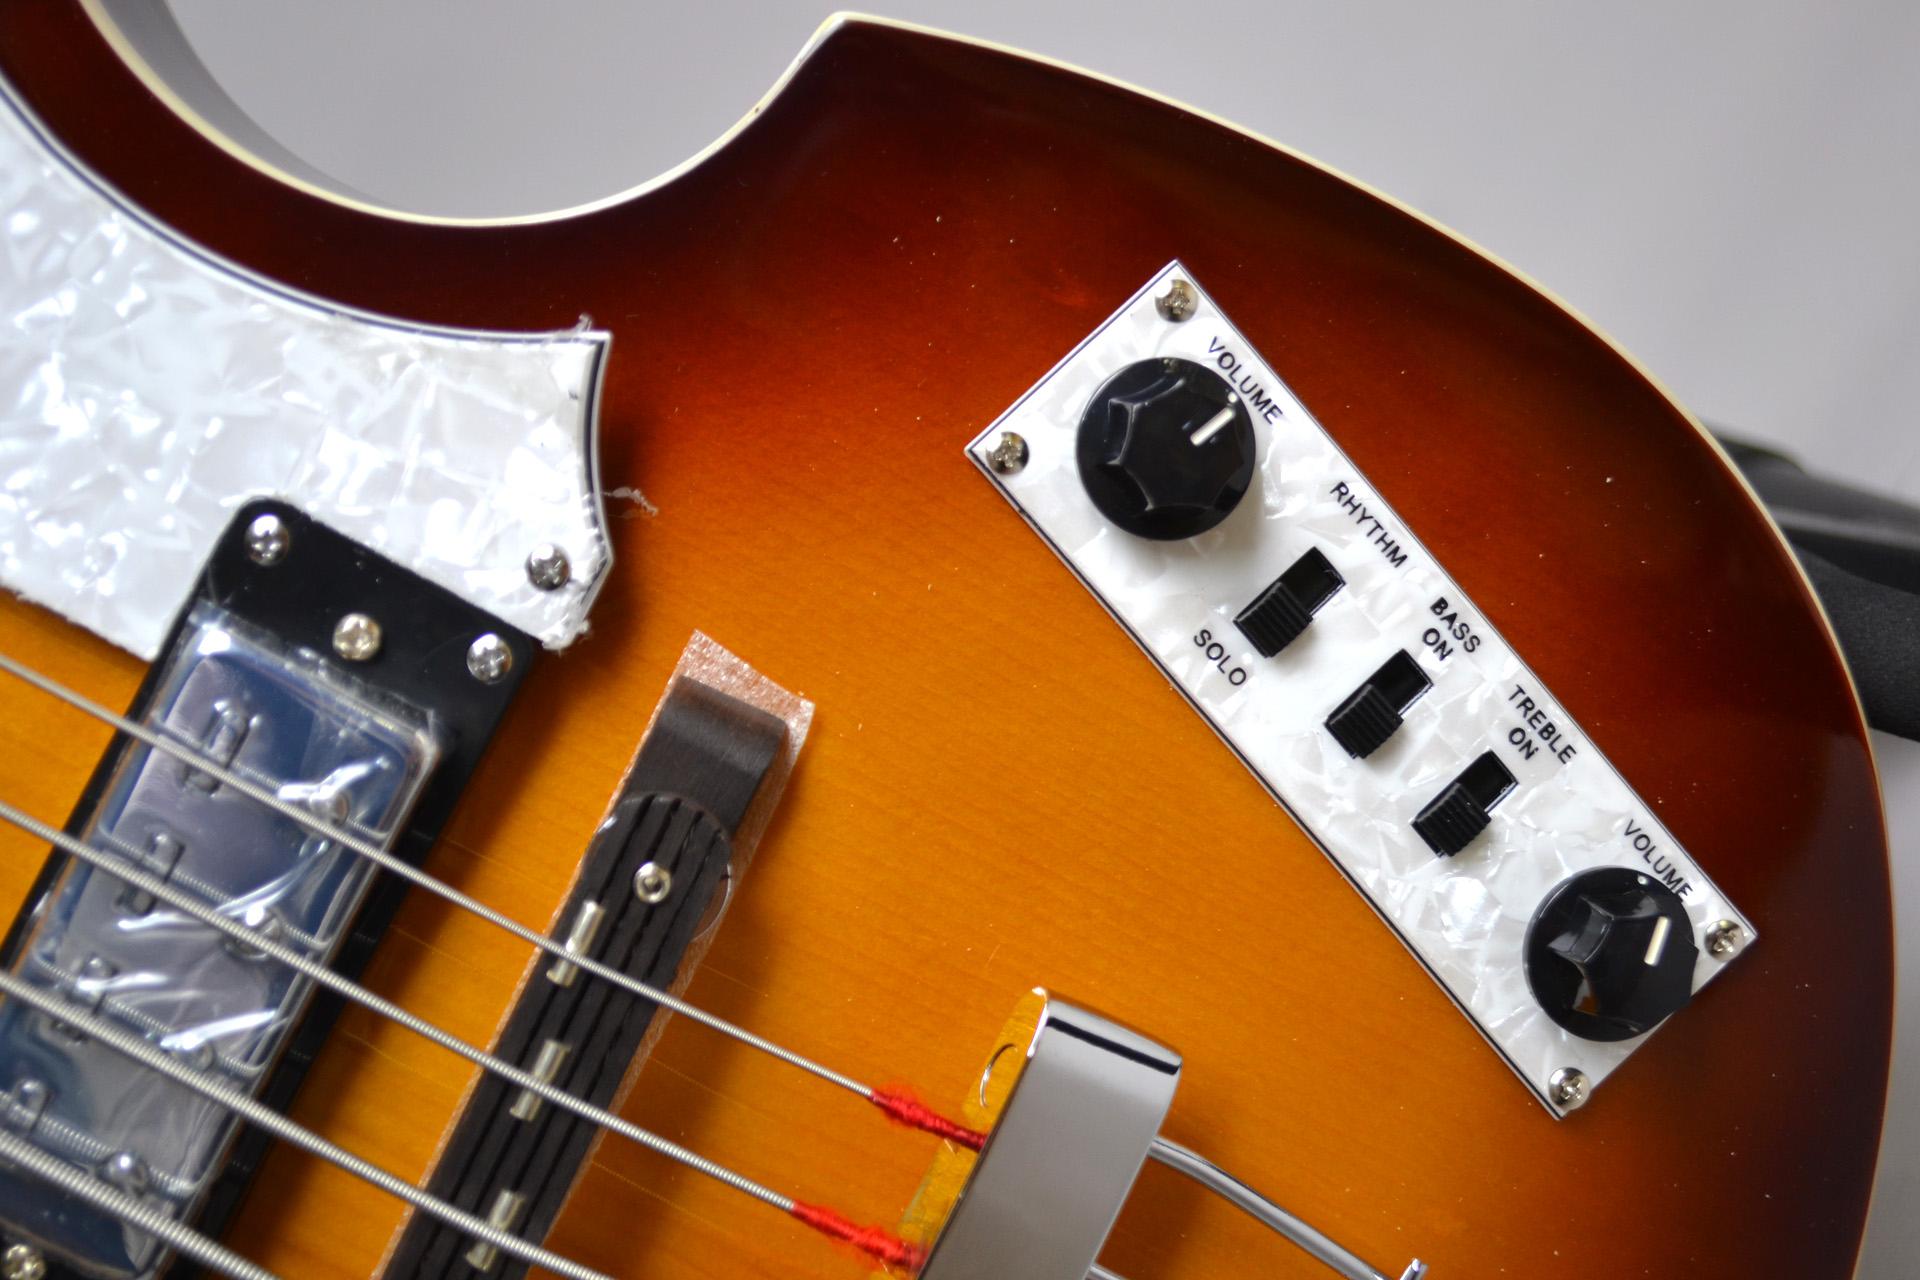 IGNITION BASS SB Violin Bassのボディバック-アップ画像